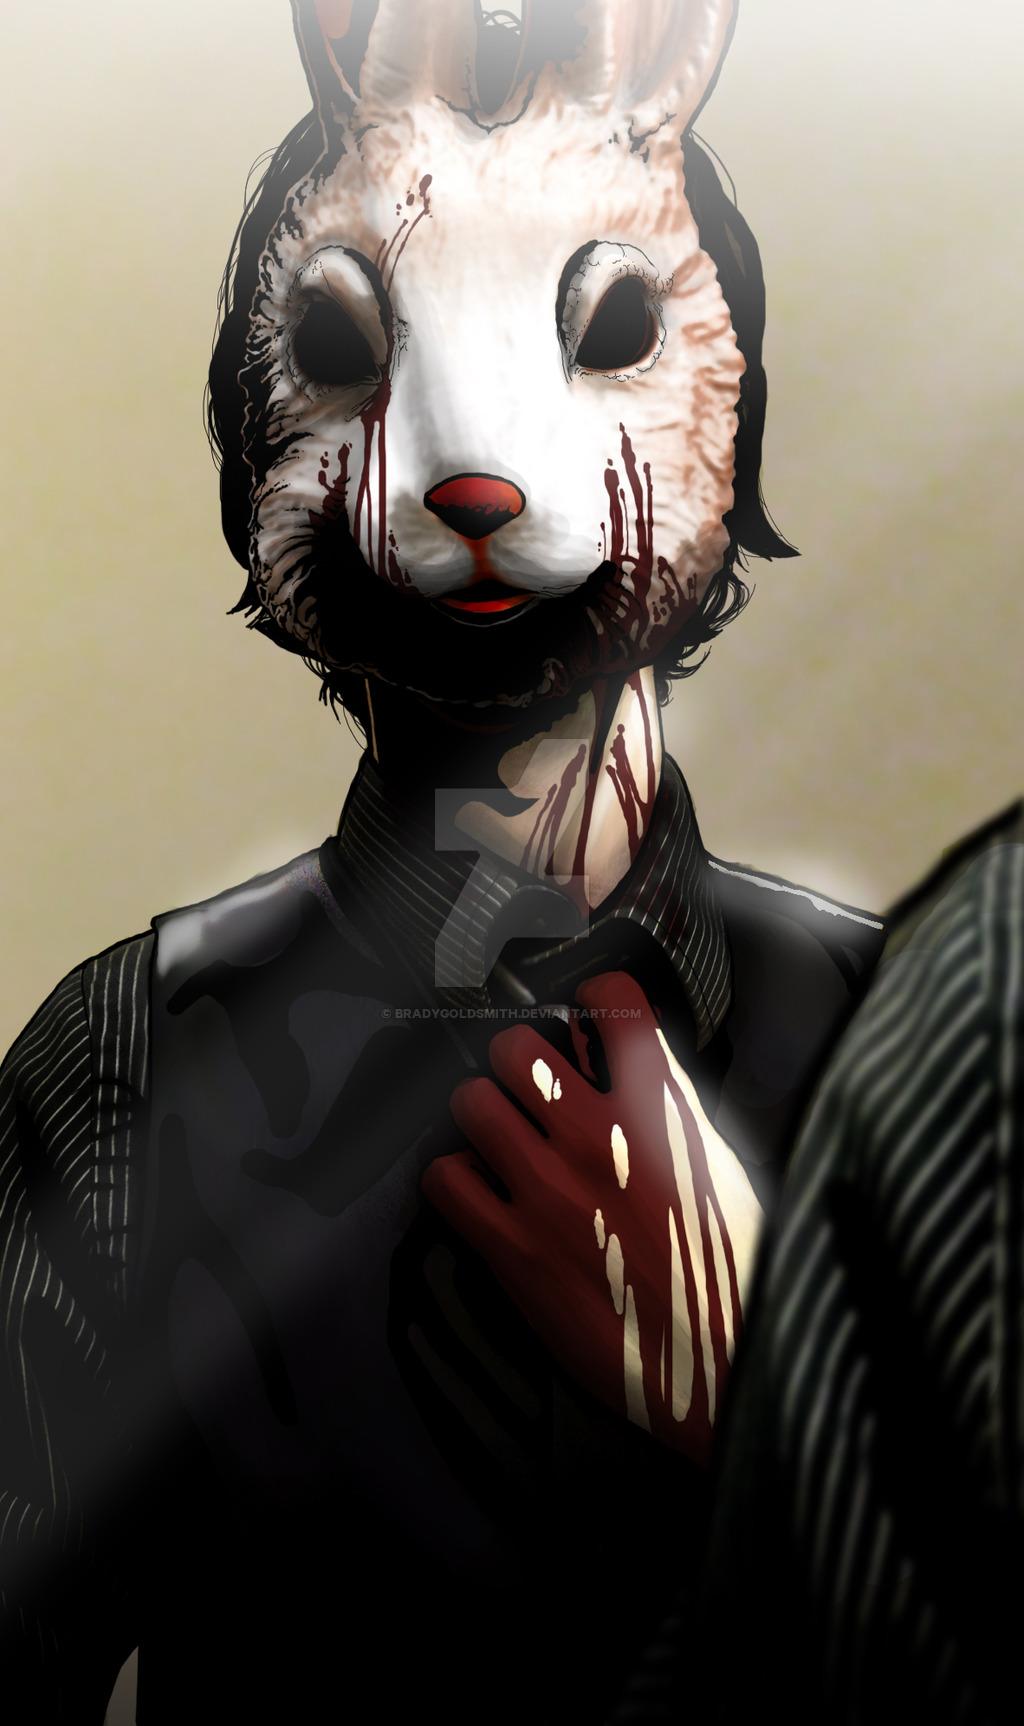 serial_killer_by_bradygoldsmith-d64yupf.jpg